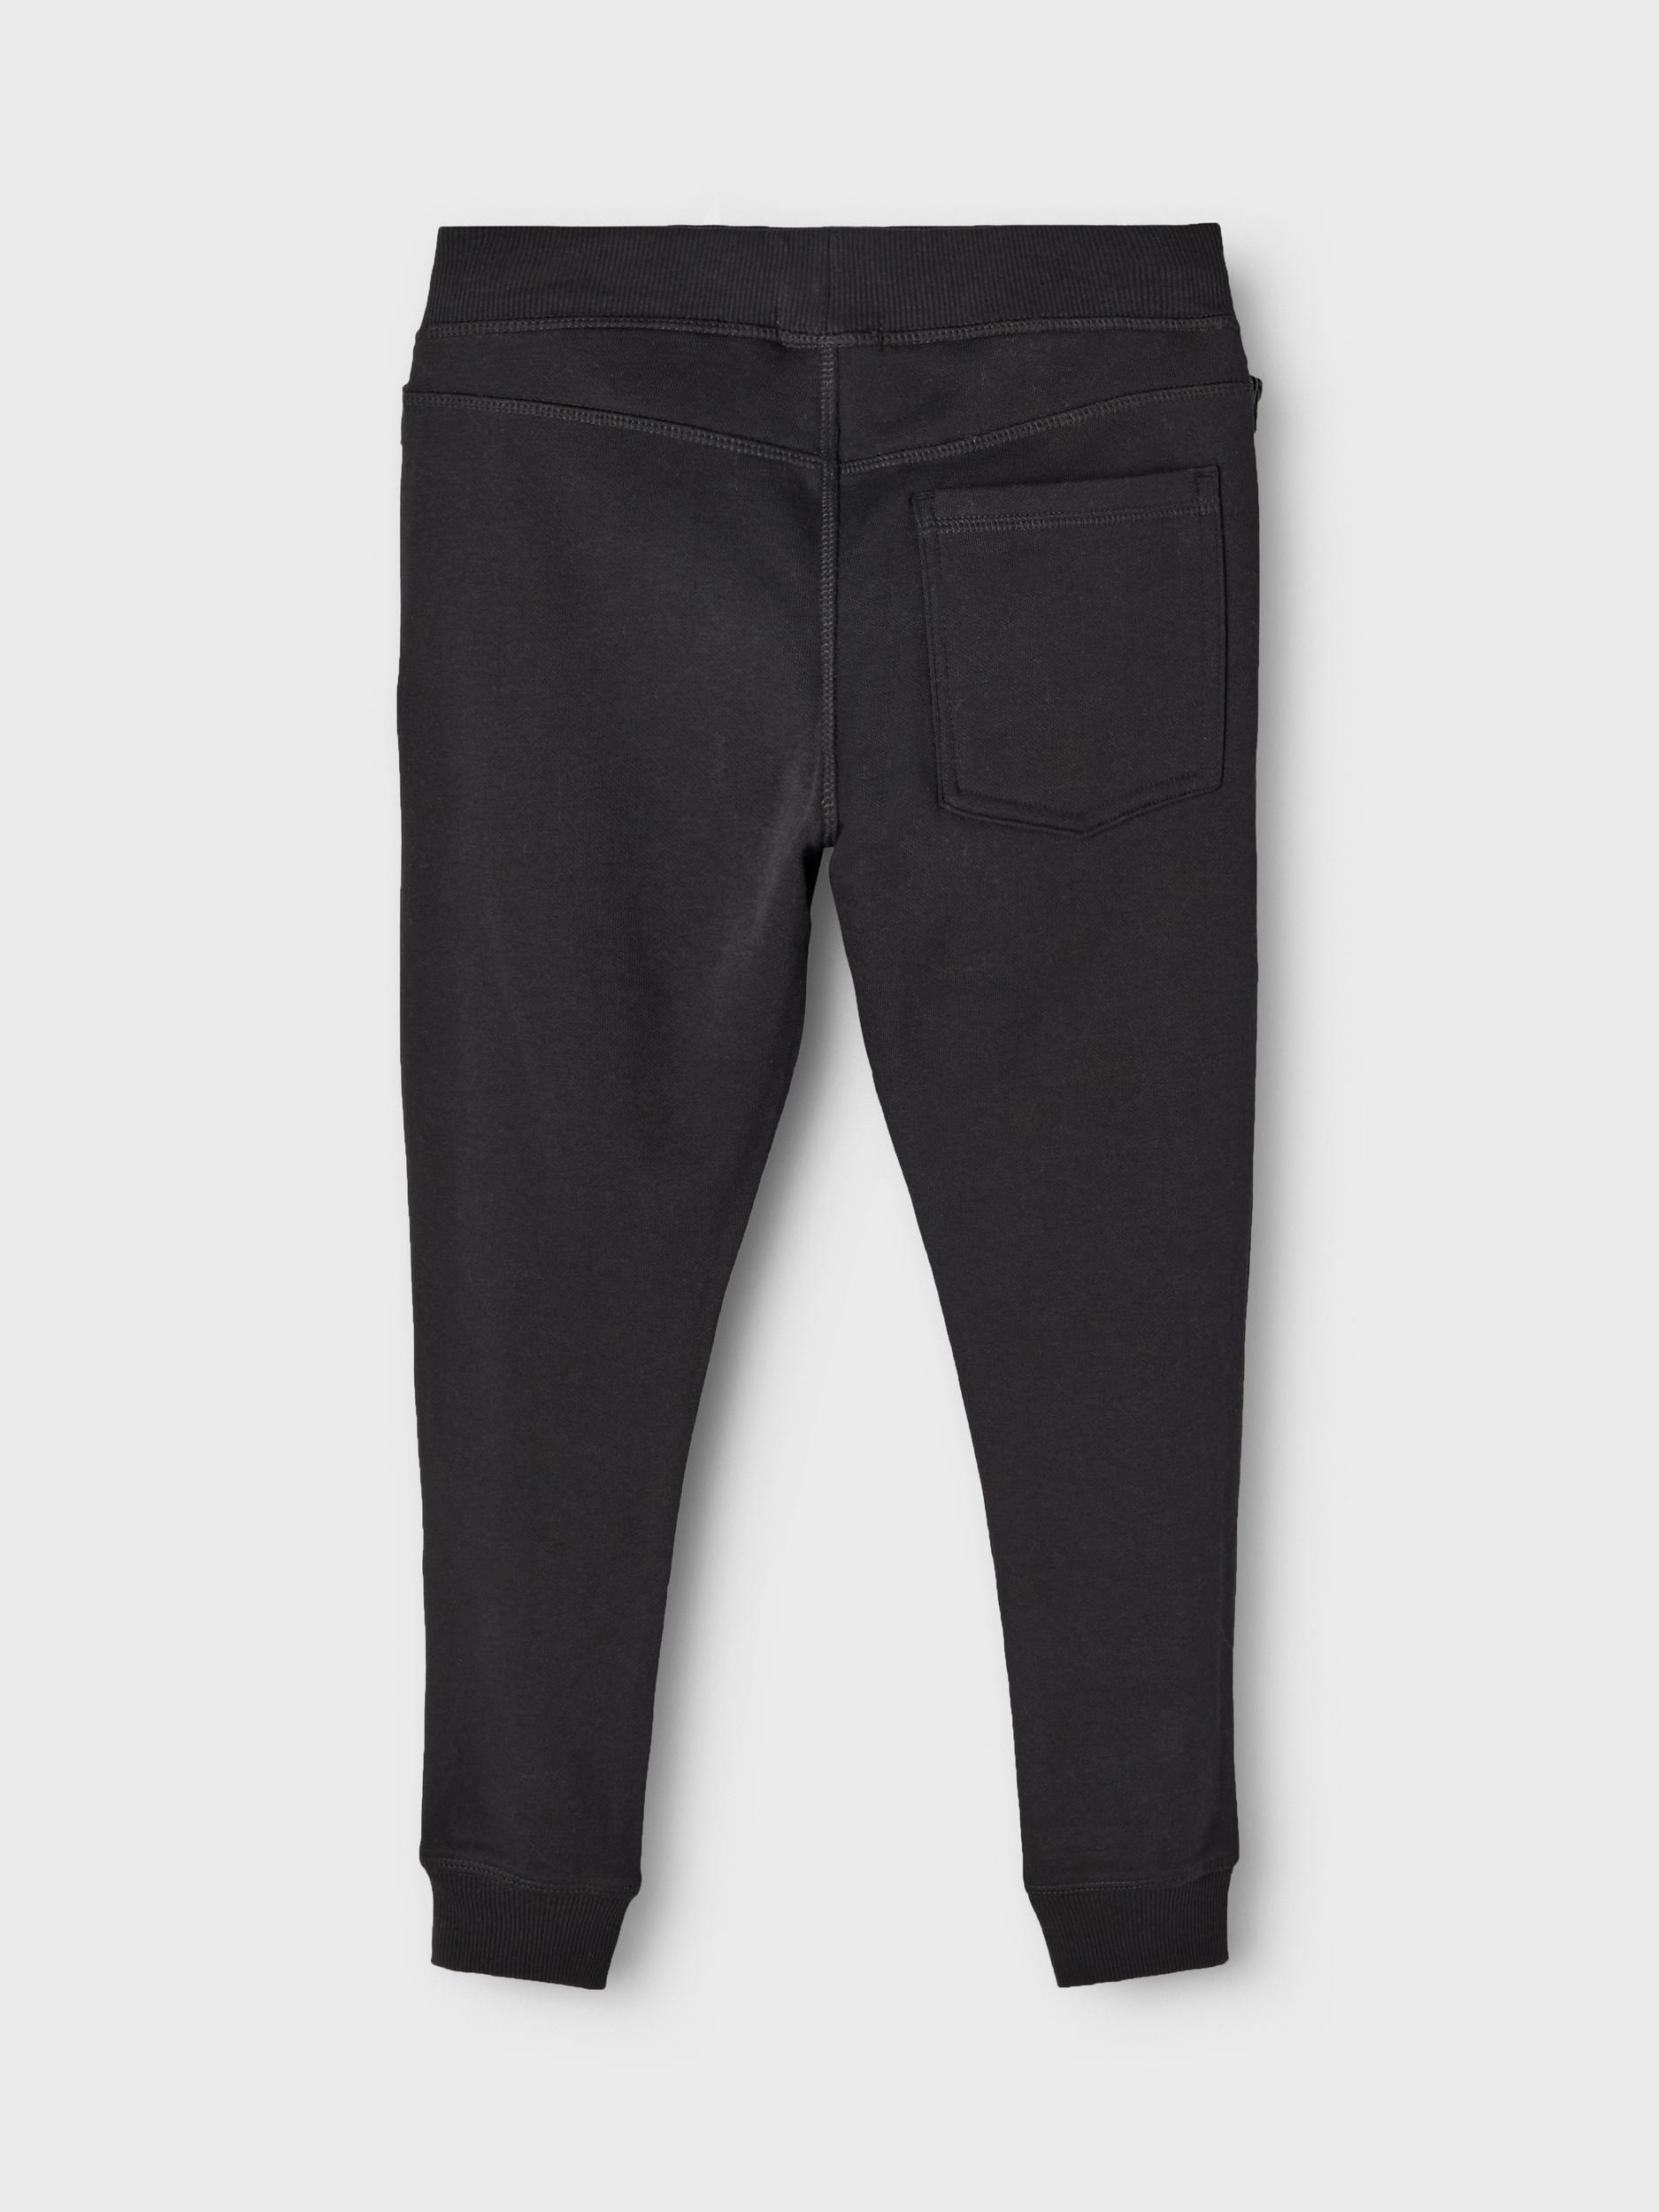 Name It Vimo sweatpants, sort, 140 cm